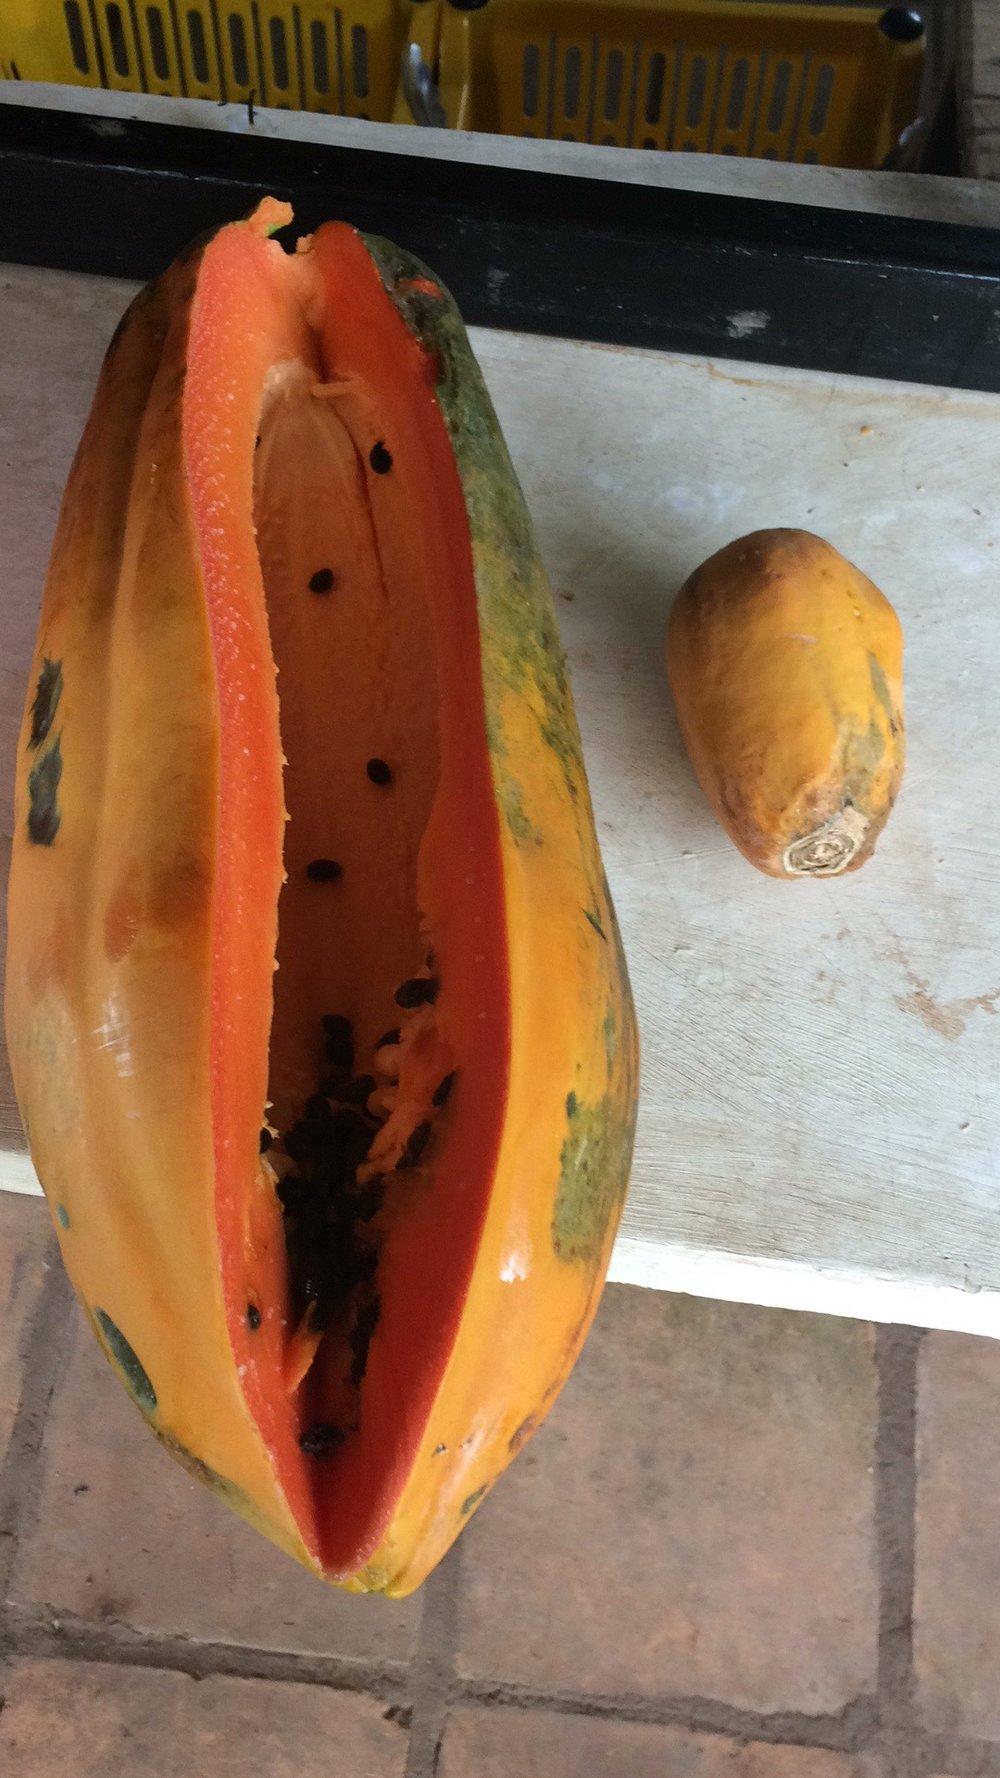 MMMMMMMMM Papaya!!